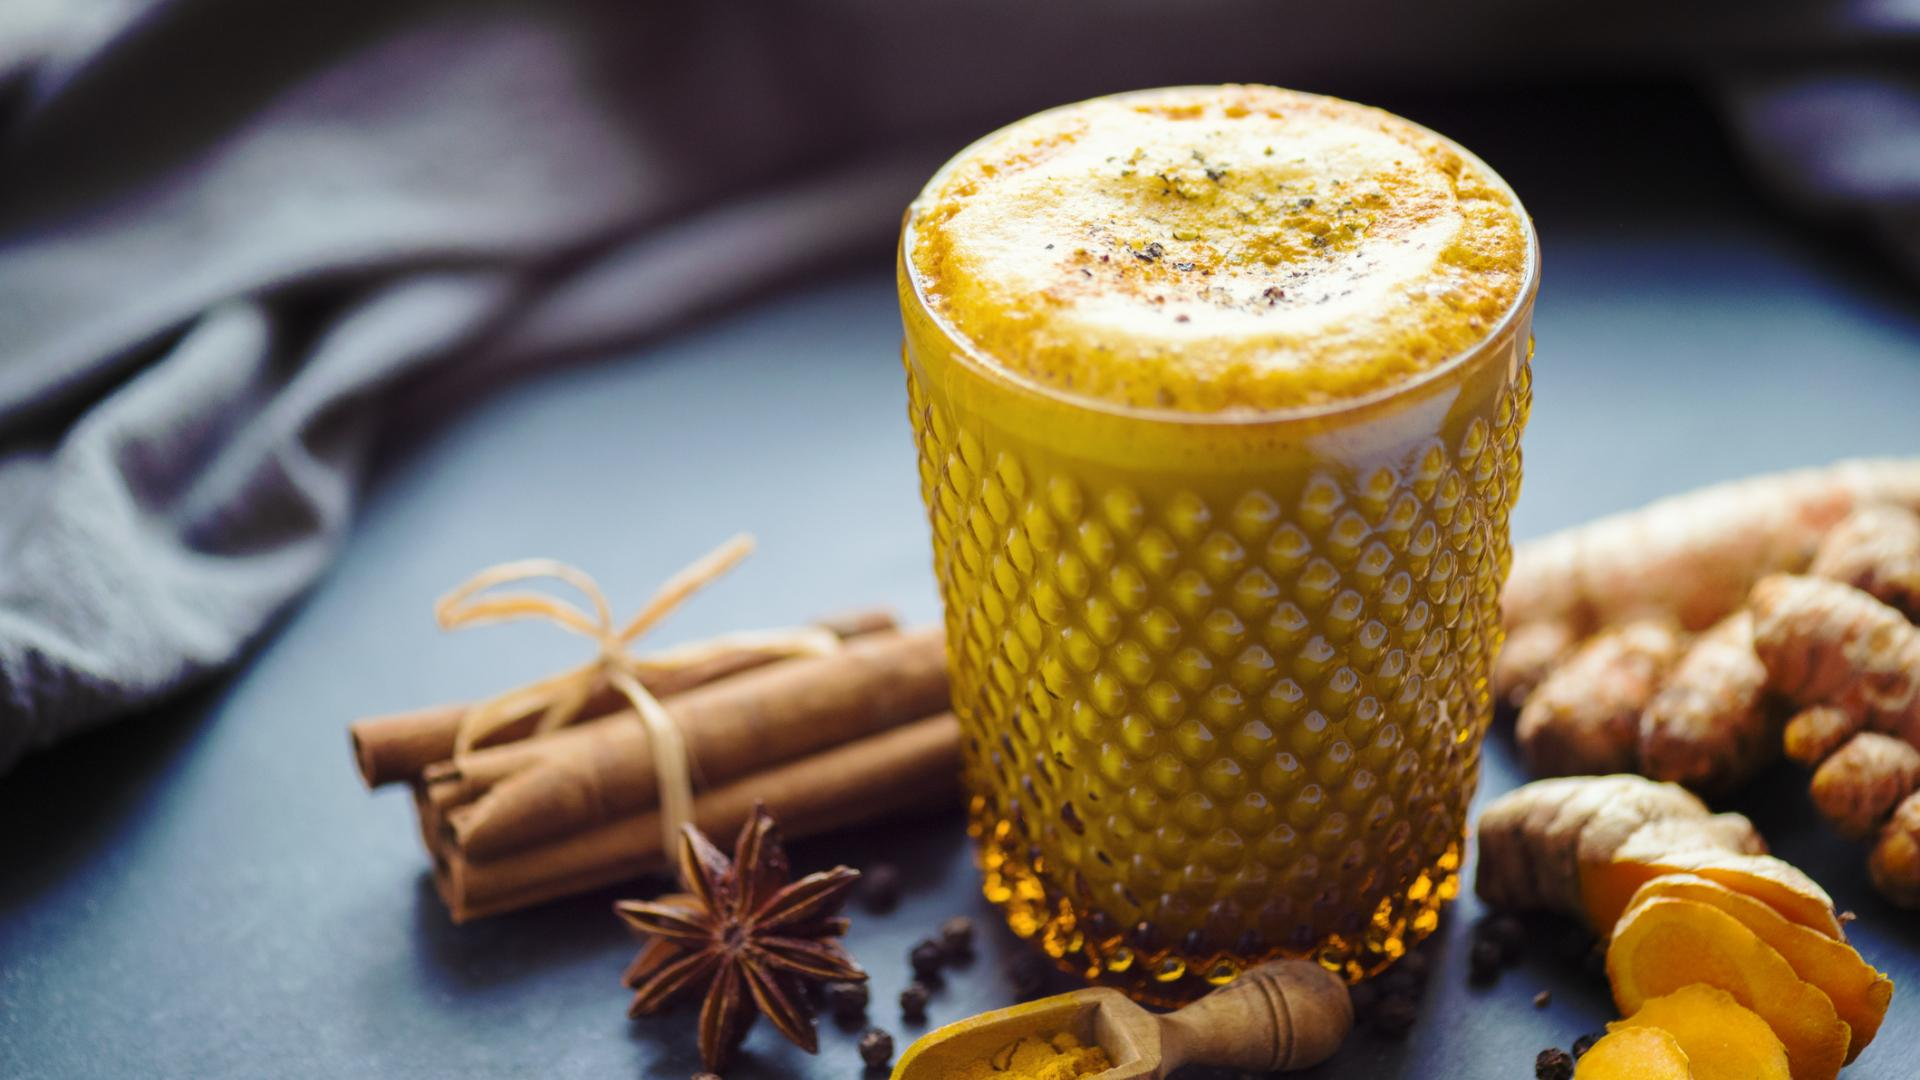 Goldene Milch Kurkuma Latte Ingwer Honig Zimt